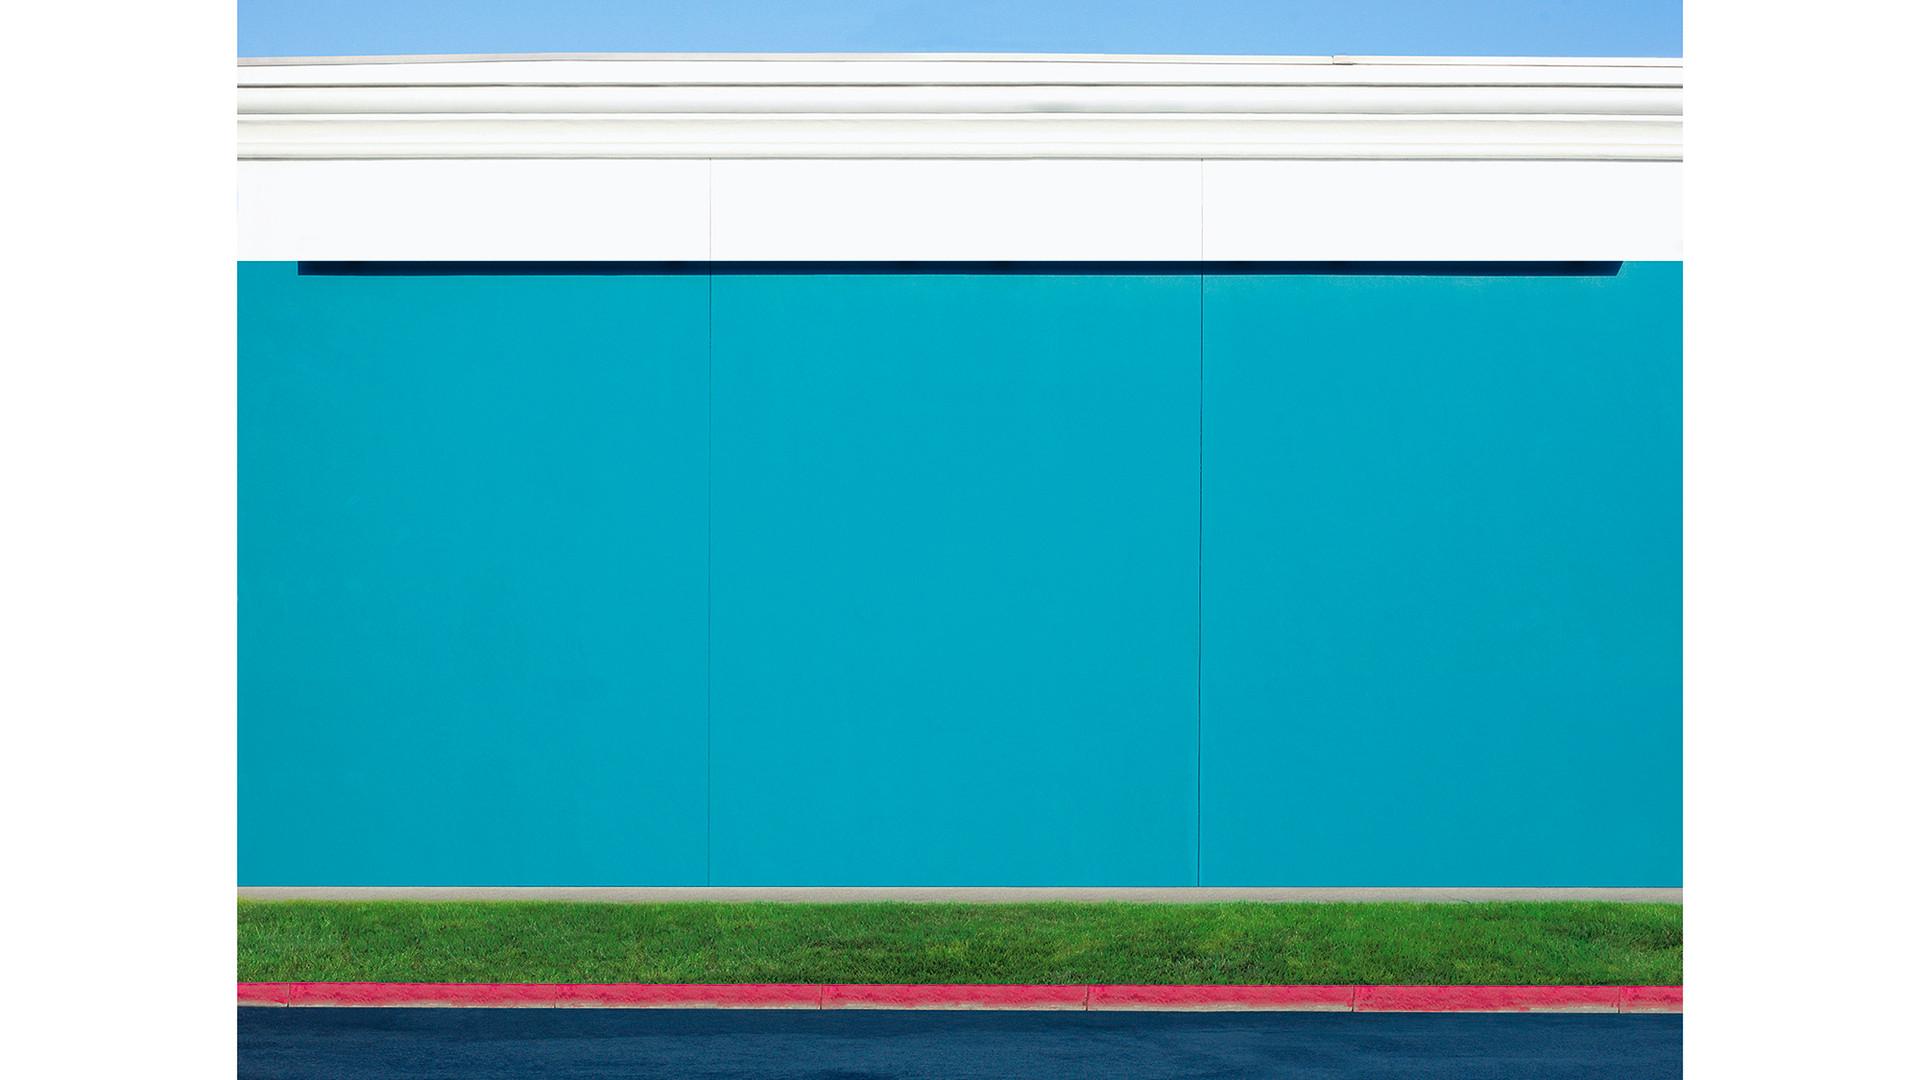 Orange Drive, 2017 140x182cm, archival pigment print, ed. of 7